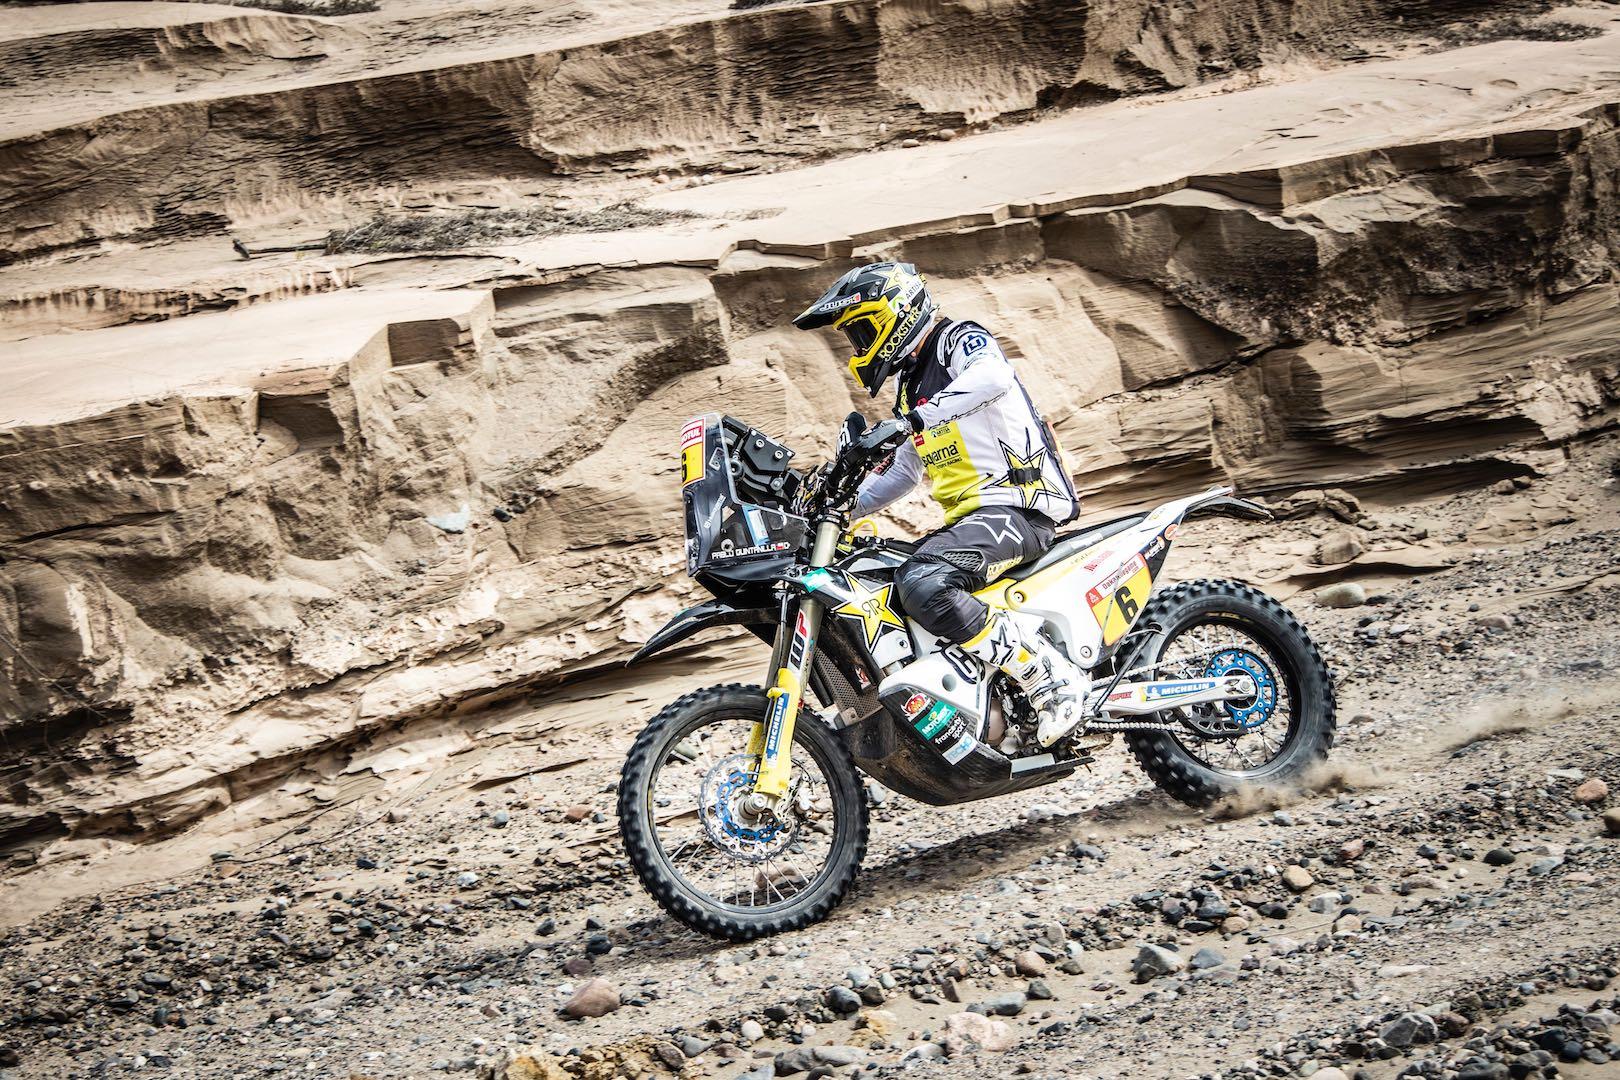 2019 Dakar Rally Stage 3 Husqvarna Pablo Quintanilla